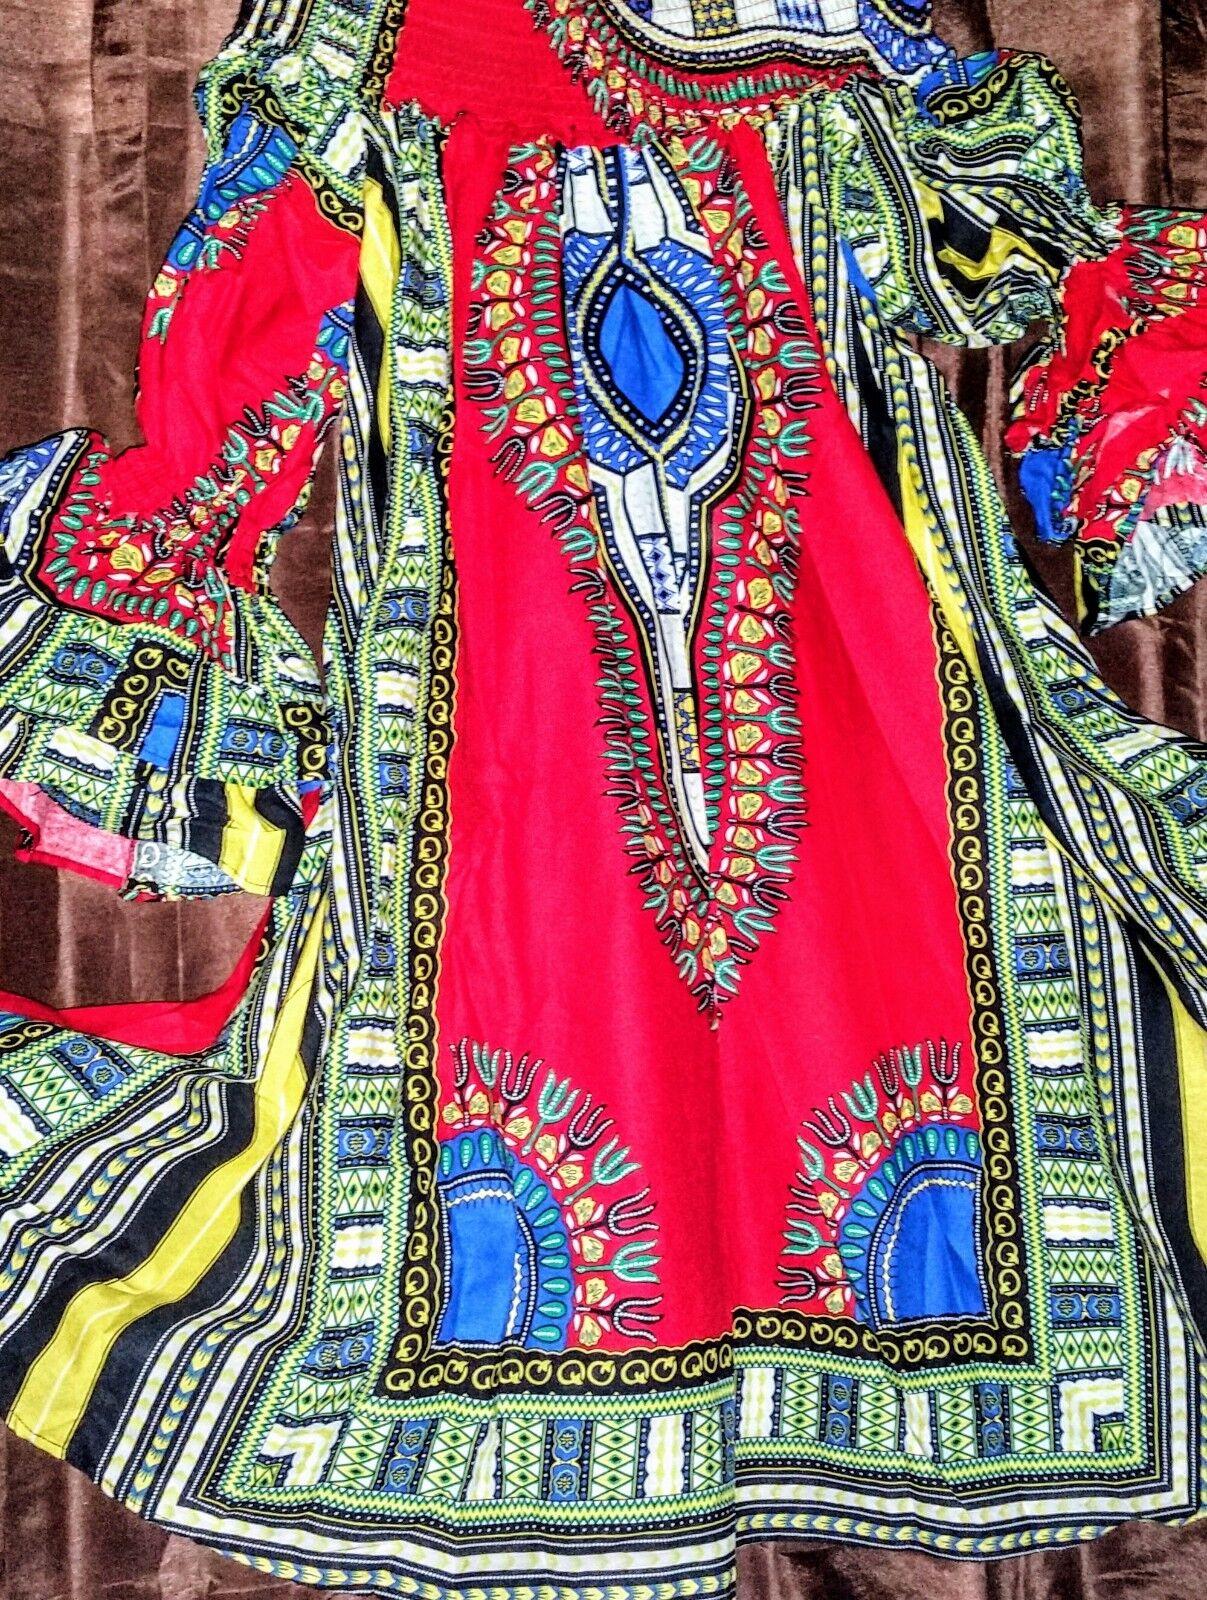 FT Women M Red African Print Off Shoulder Shoulder Shoulder Below Knee Ruffle Sleeve Cotton Dress 60334d